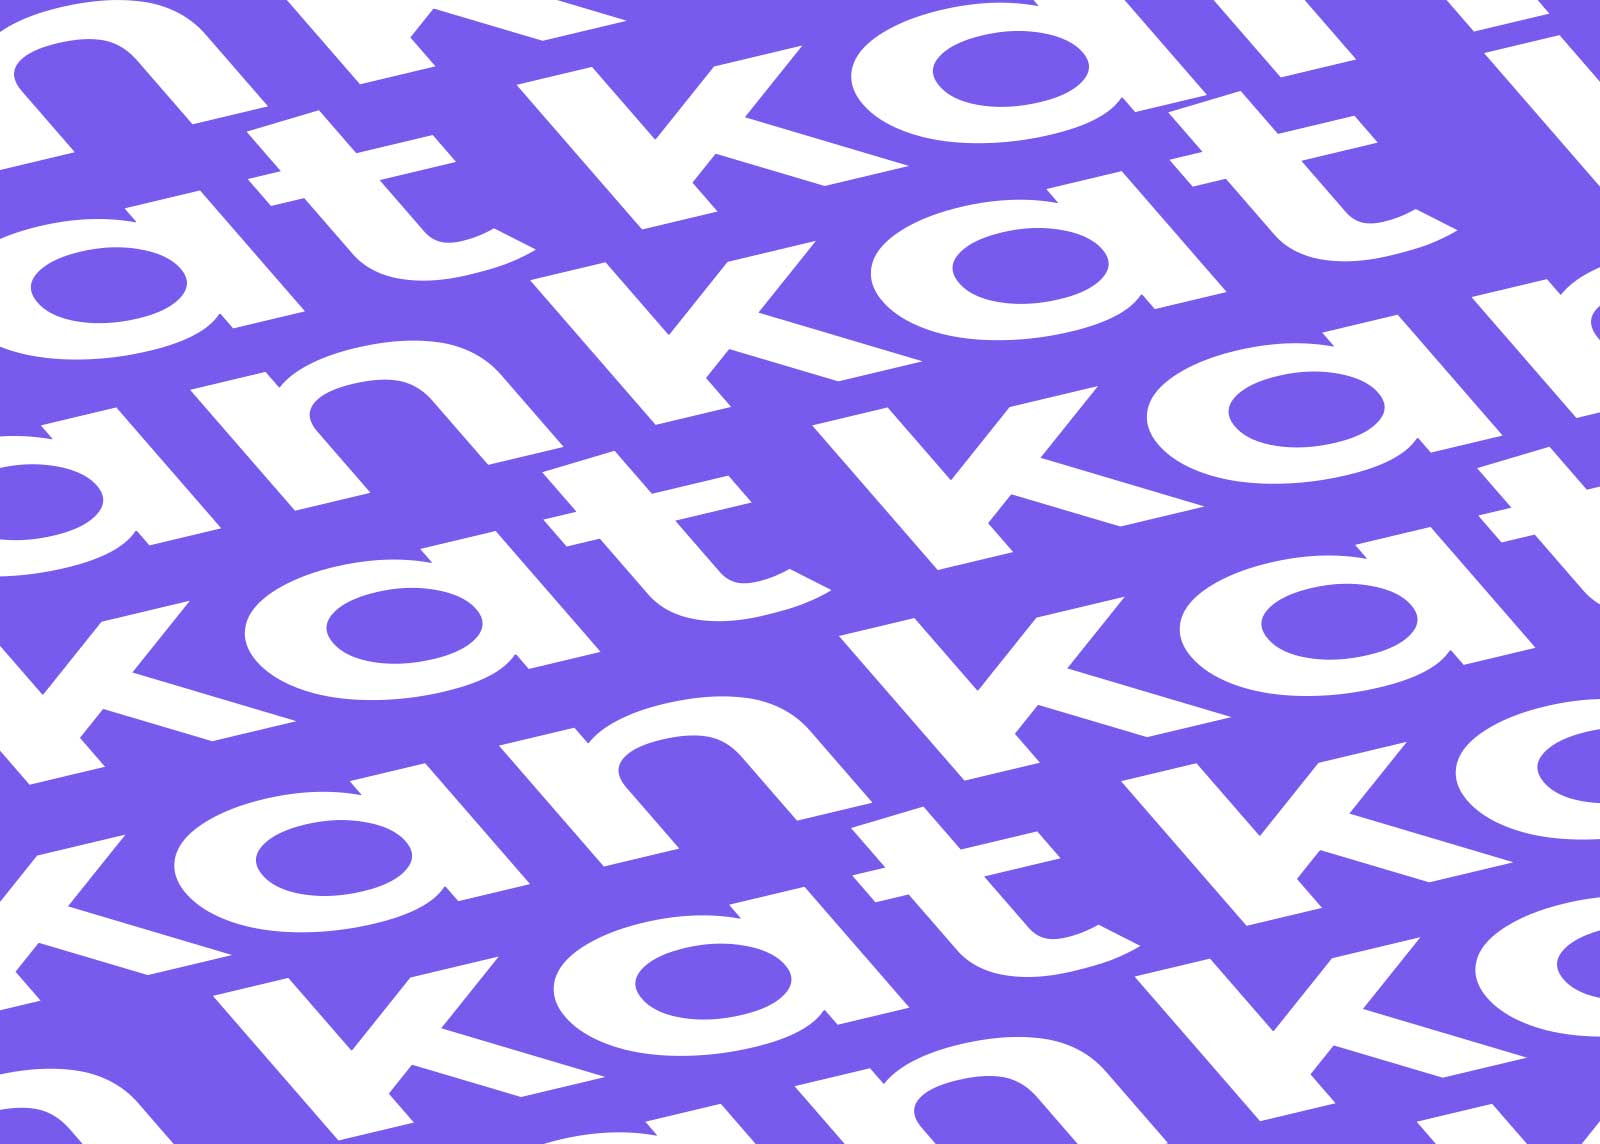 Kat Kan, Identidad corporativa, logotipo, patron corporativo